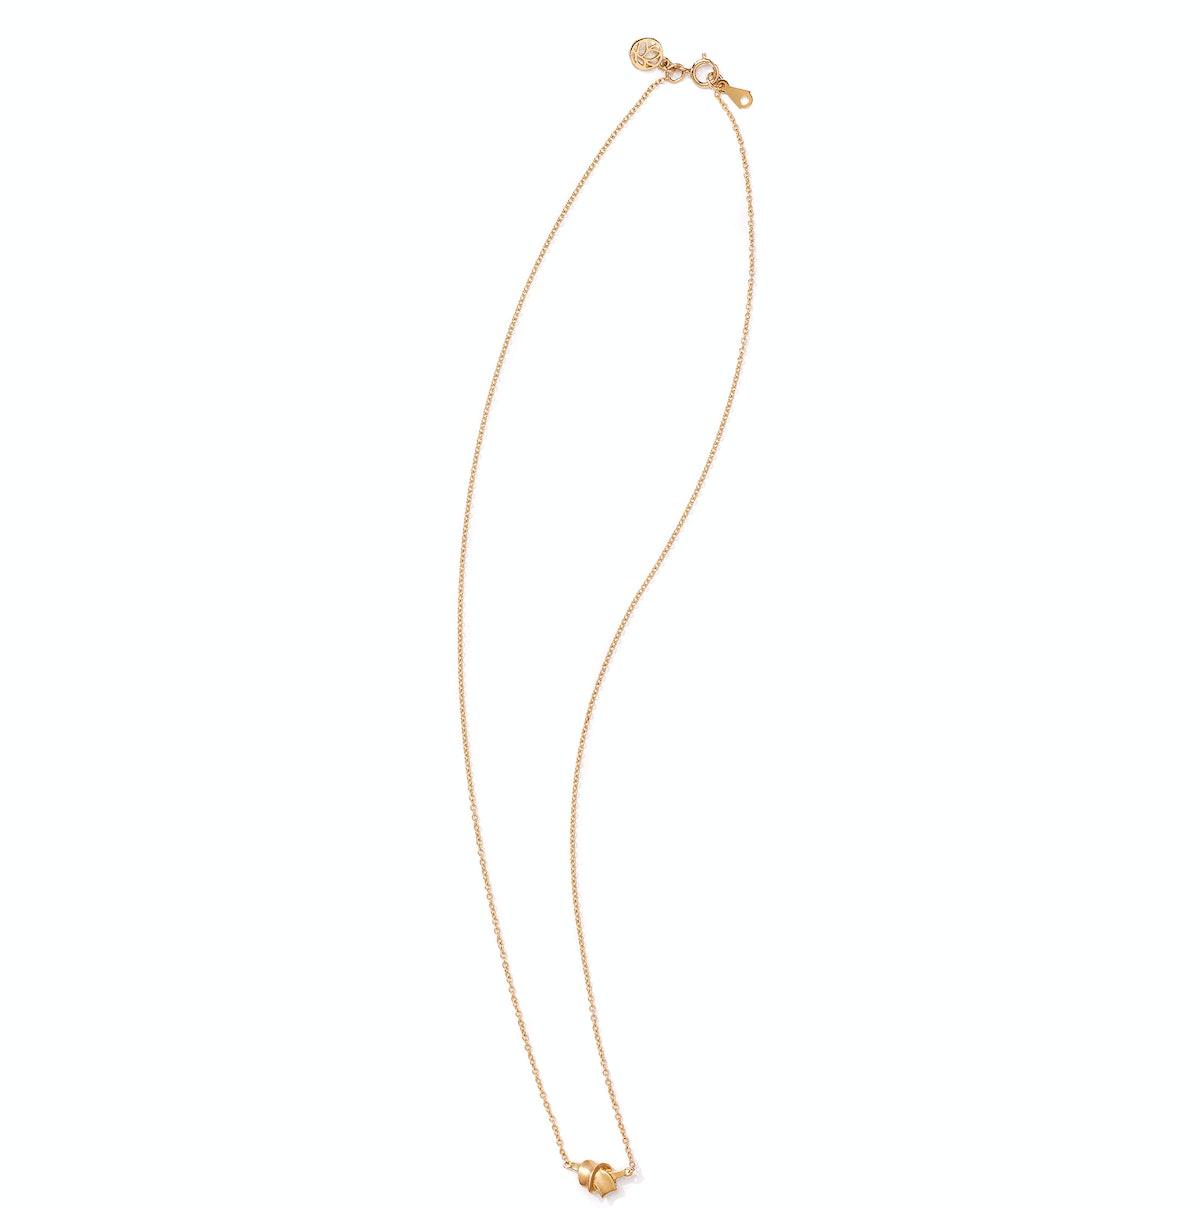 Carelle necklace